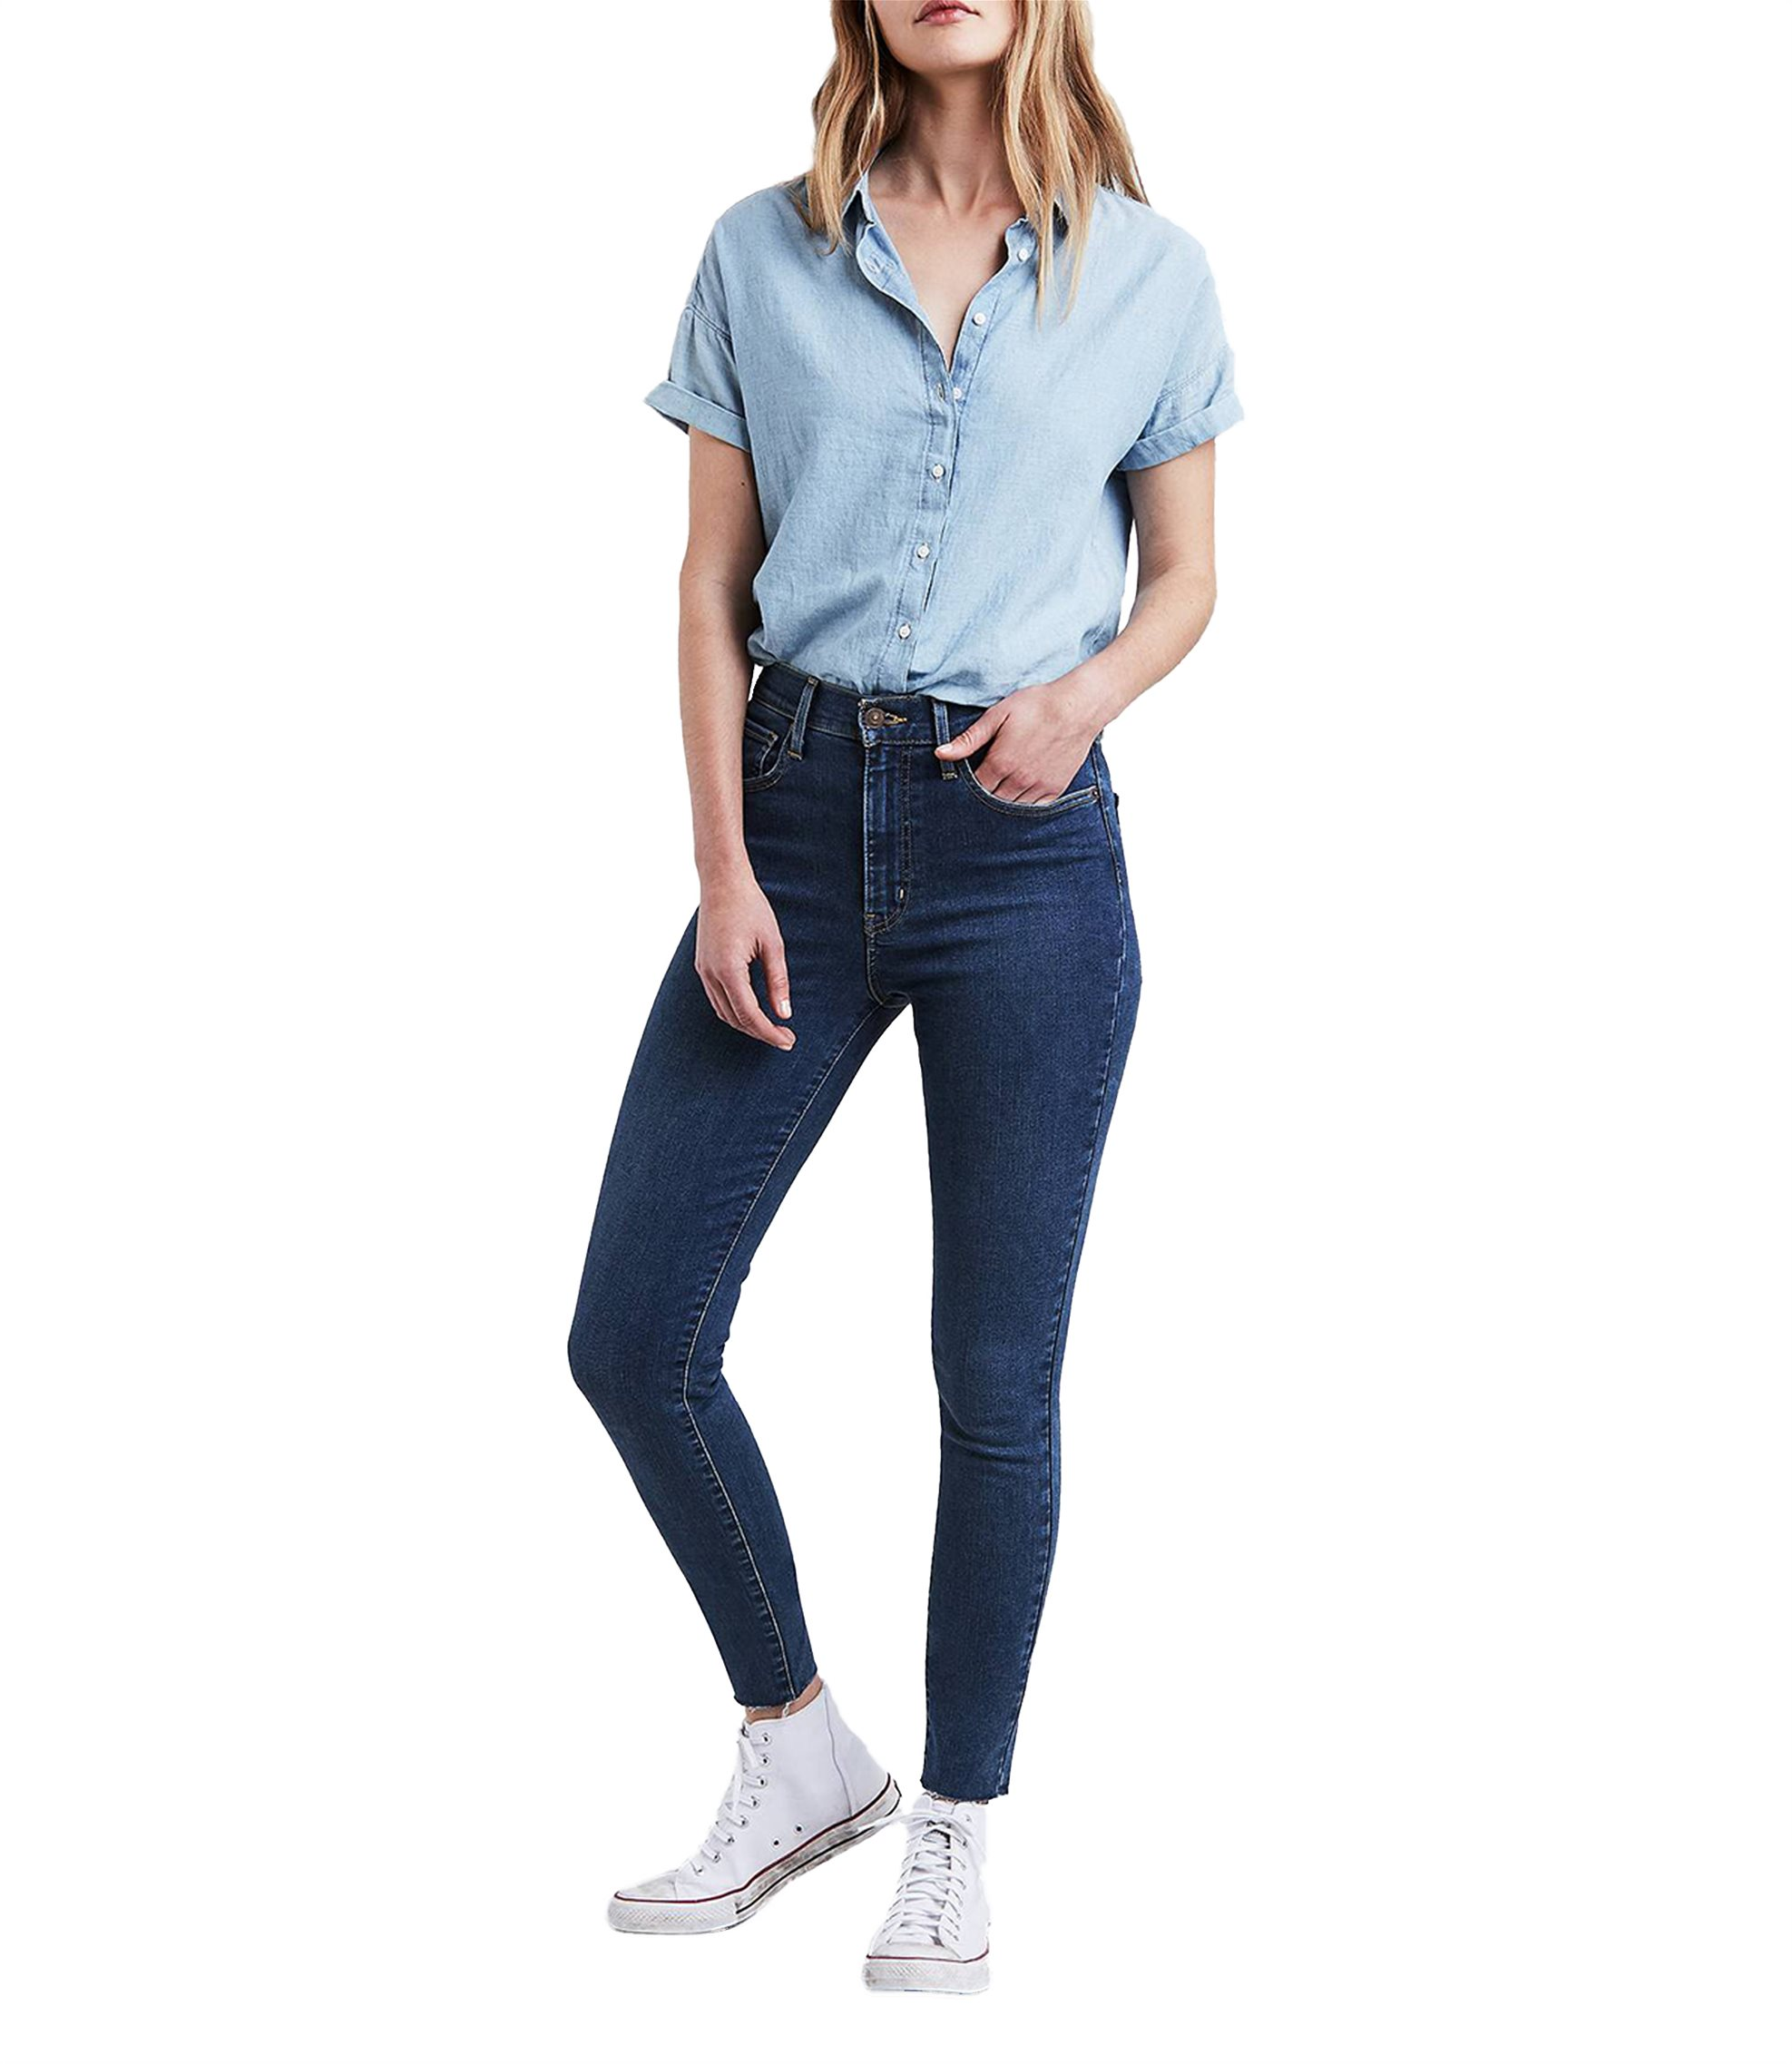 54fba005dde Γυναικείο τζην παντελόνι Mile High Super Skinny Indigo (32L) Levi's -  2279100-37-32 - Μπλε Σκούρο